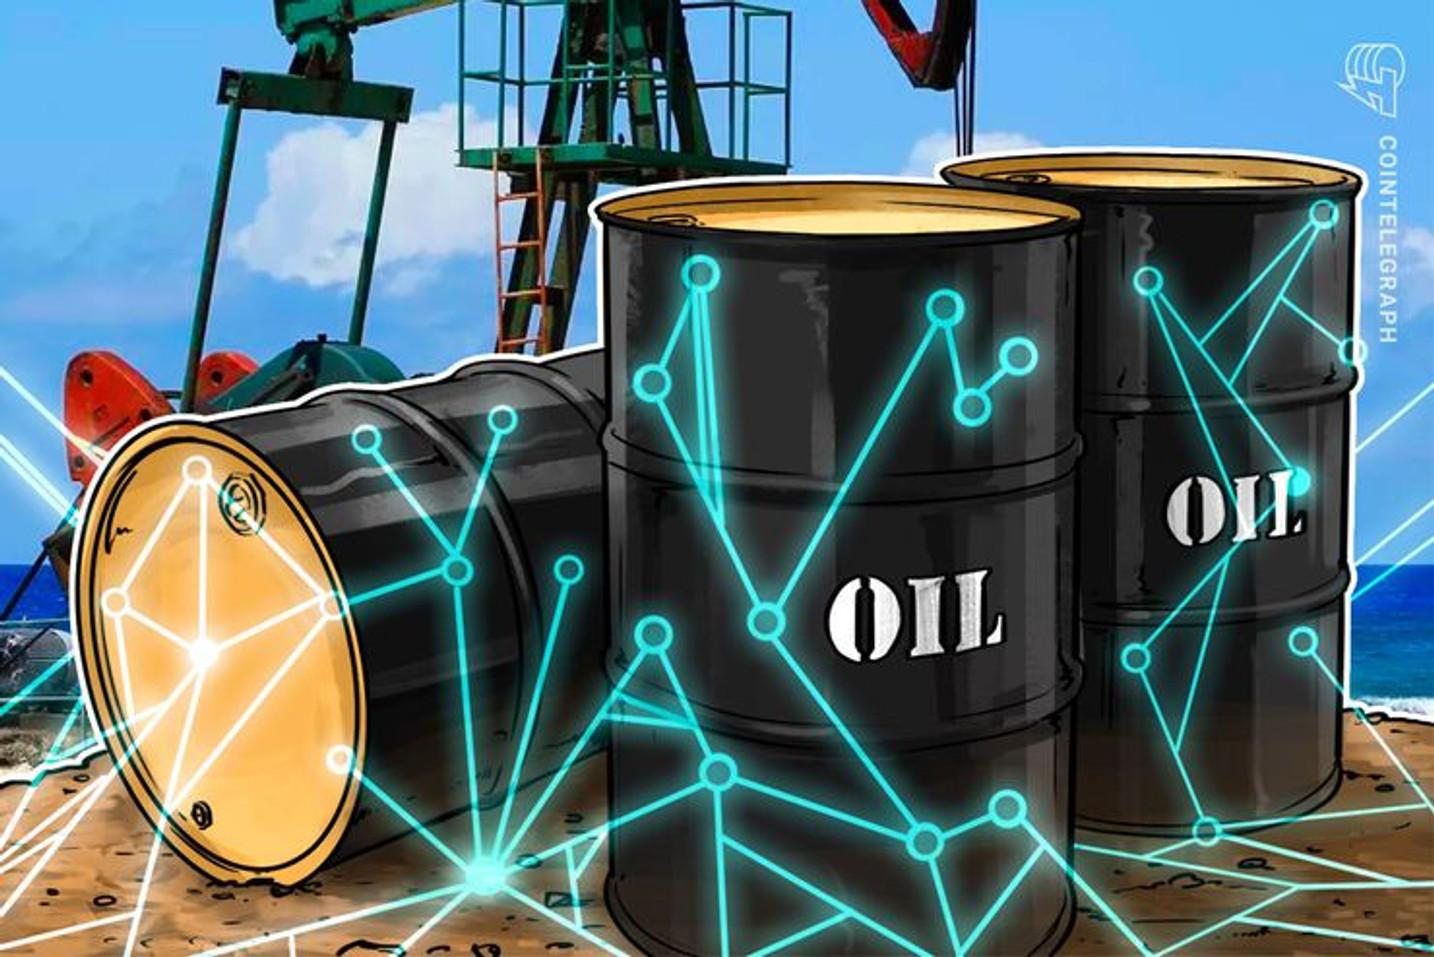 Repsol compra una parte de la startup Finboot especializada en blockchain para el sector petrolero